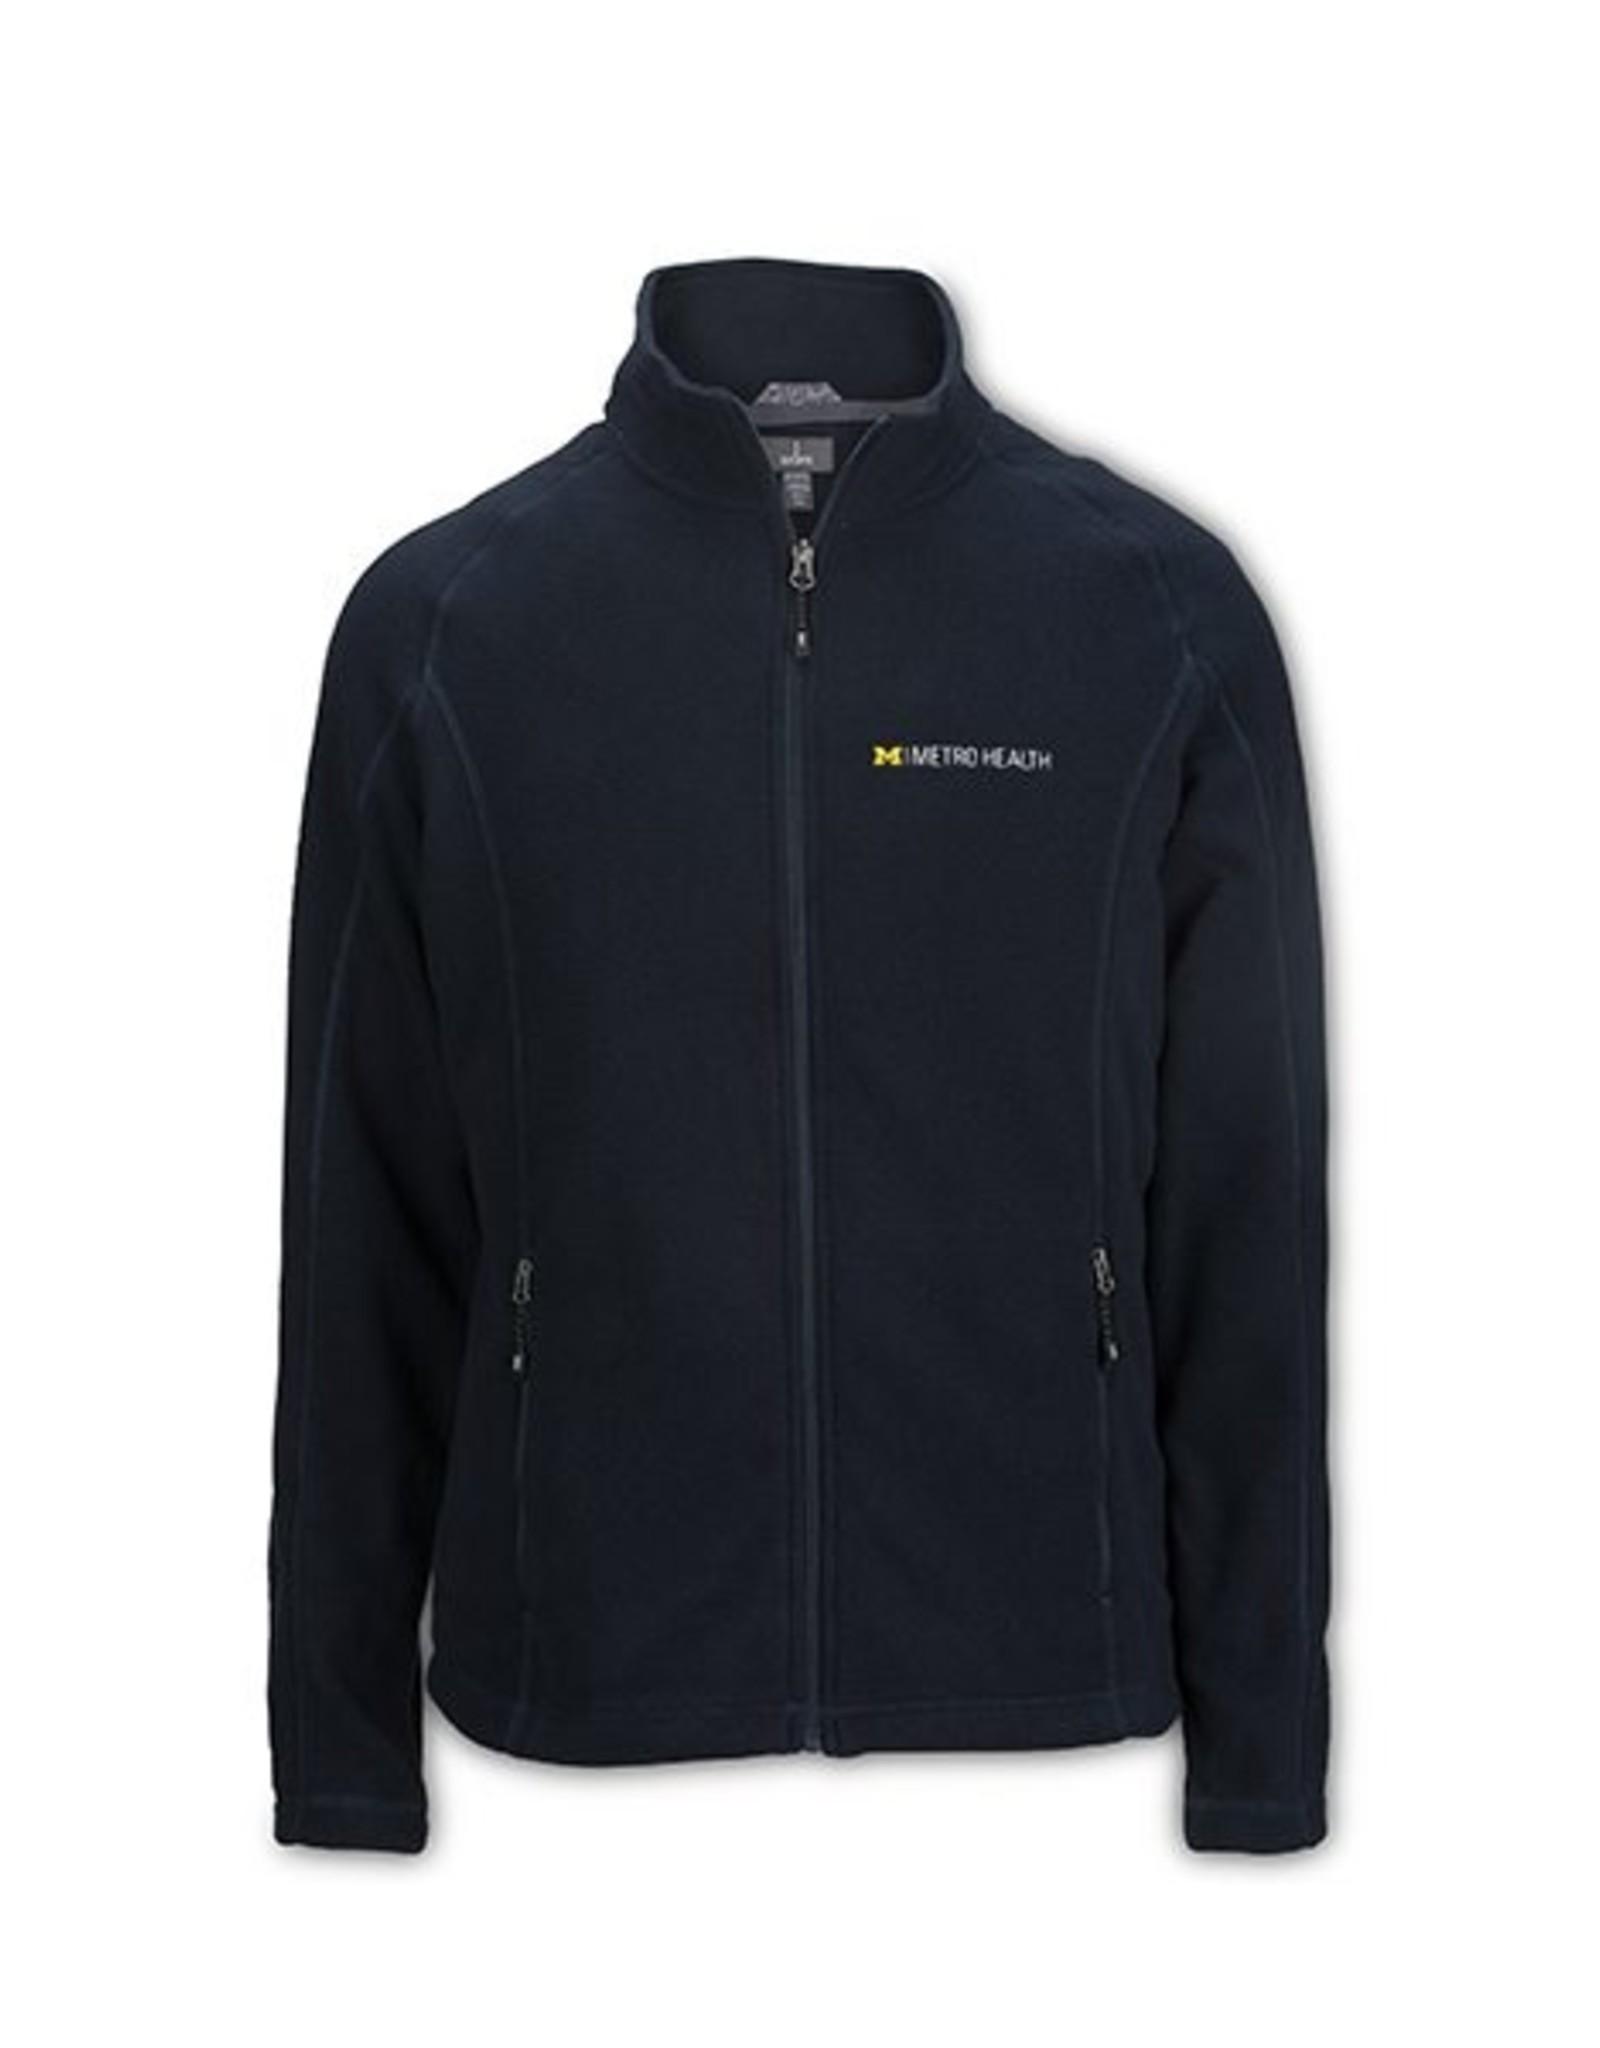 Green Giftz Men's Fleece Jacket *FINAL SALE*